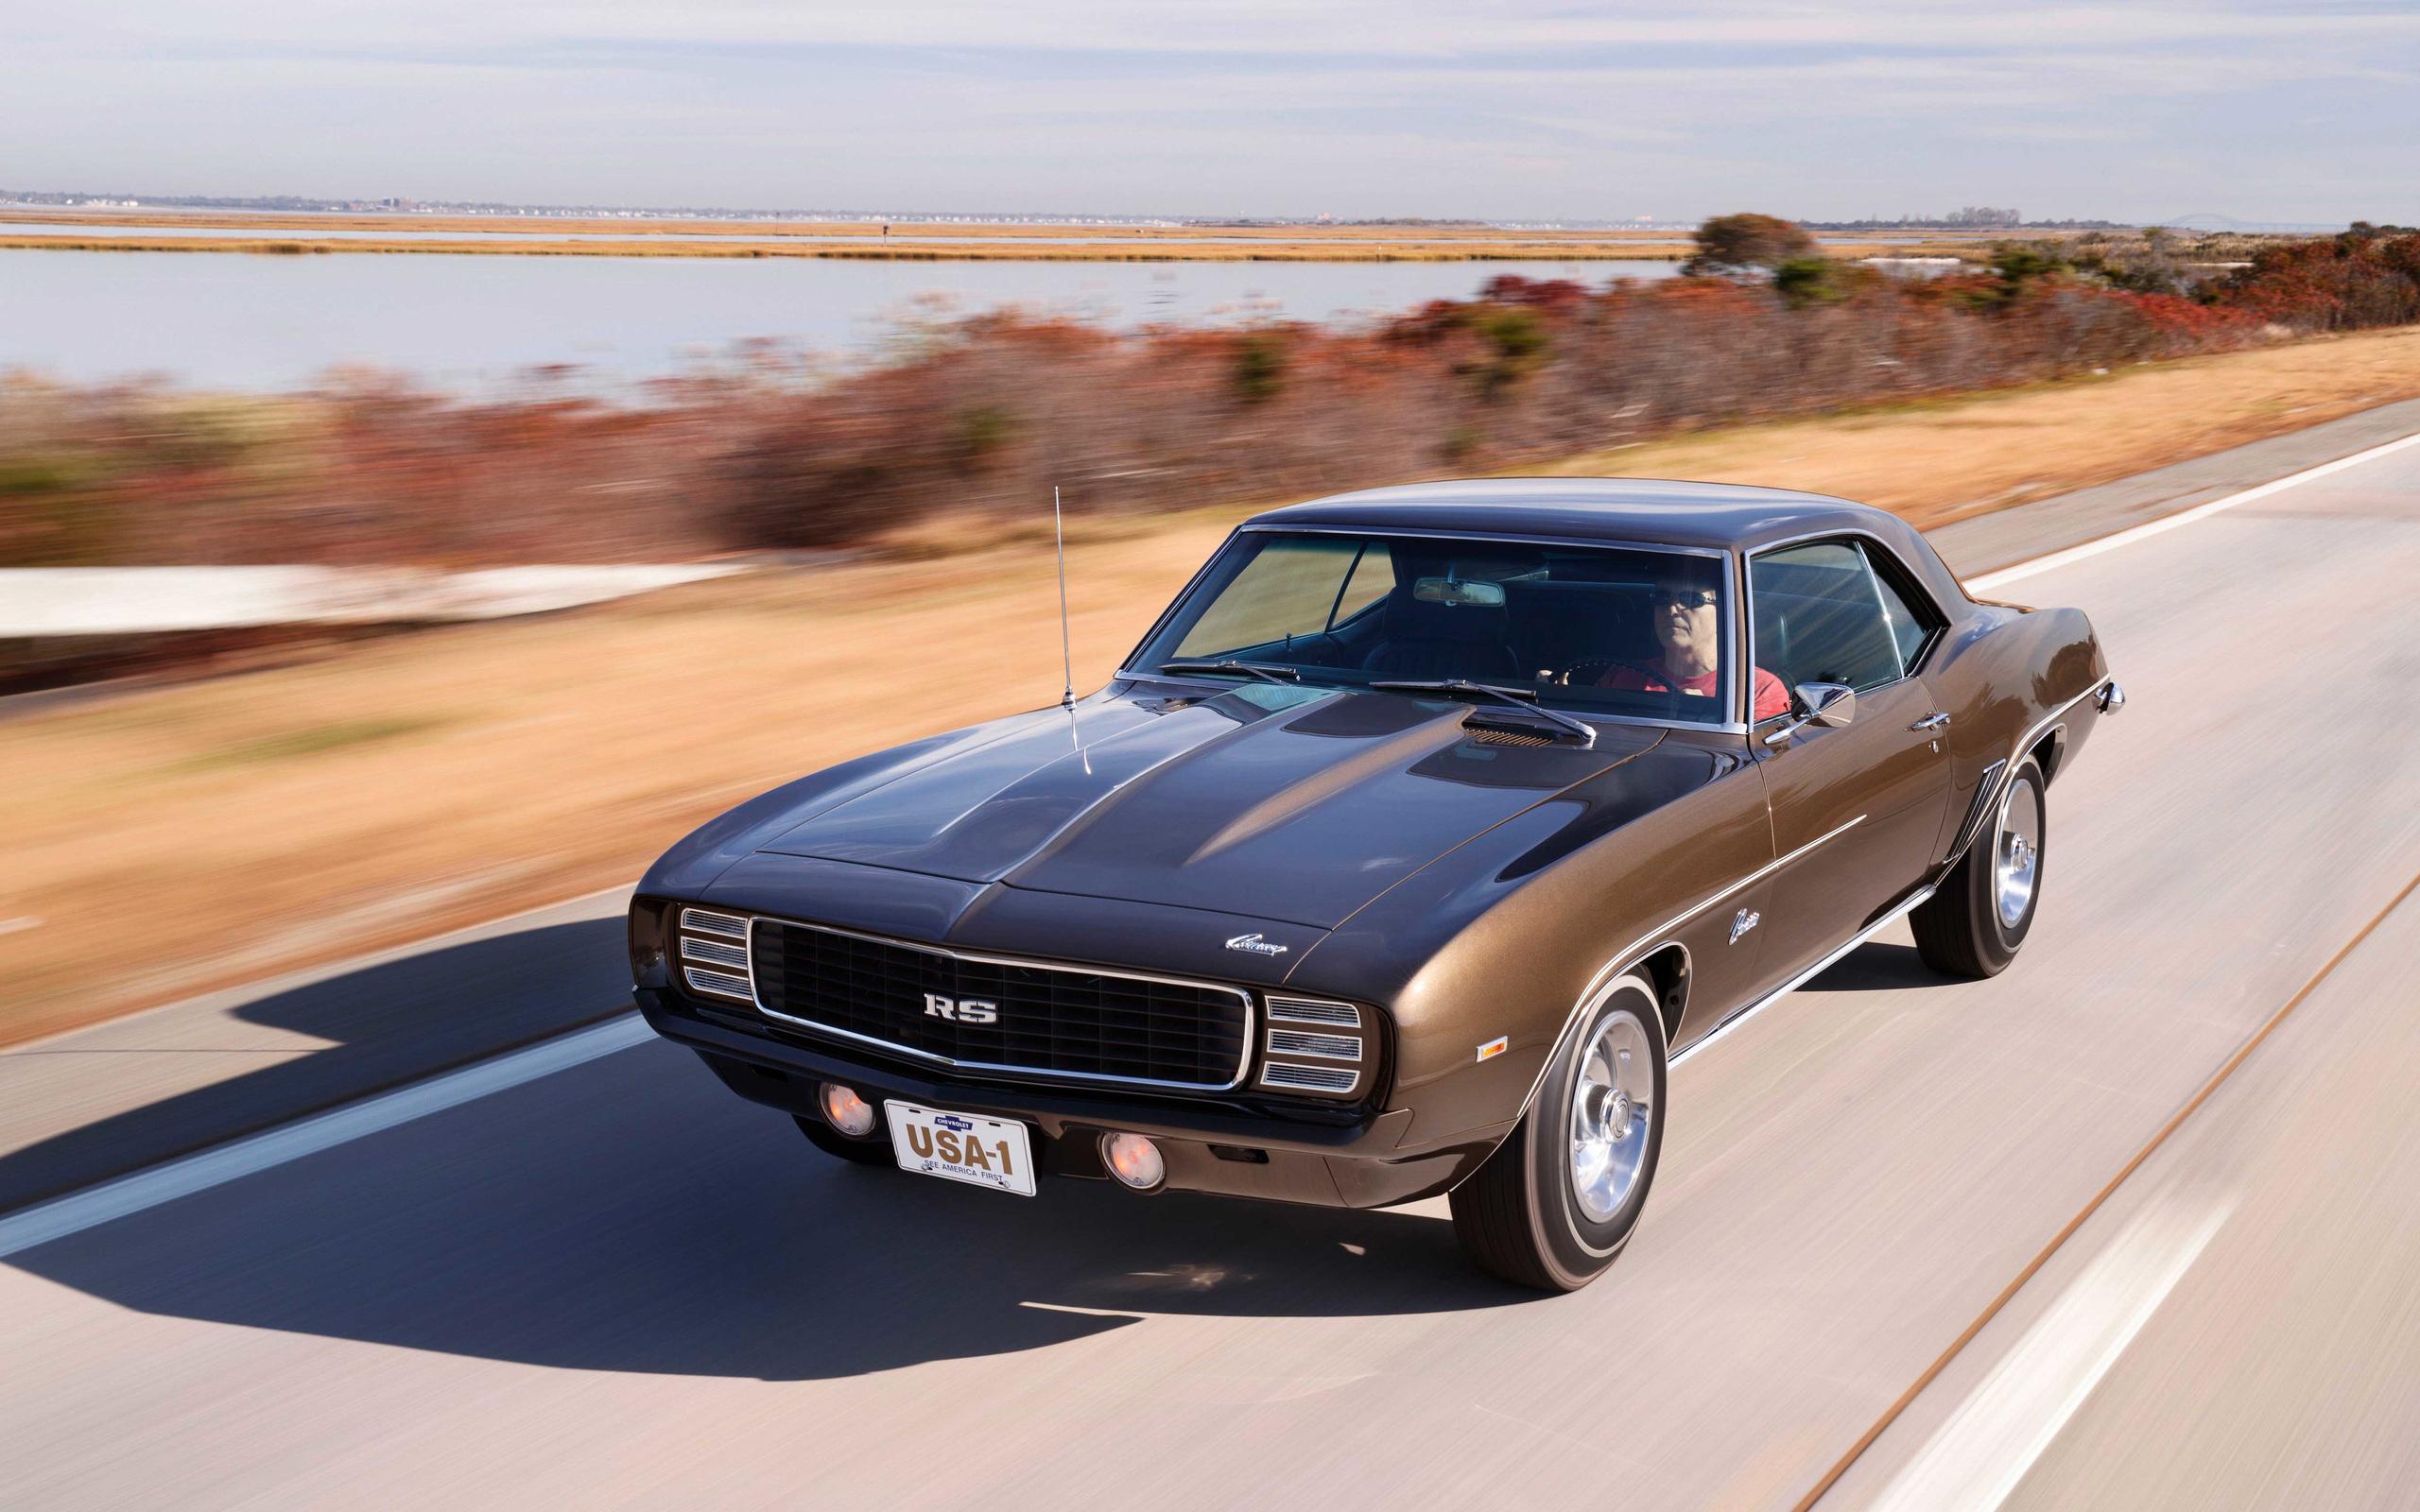 2560x1600 1969 Chevrolet Camaro L72 Rs Copo 2560x1600